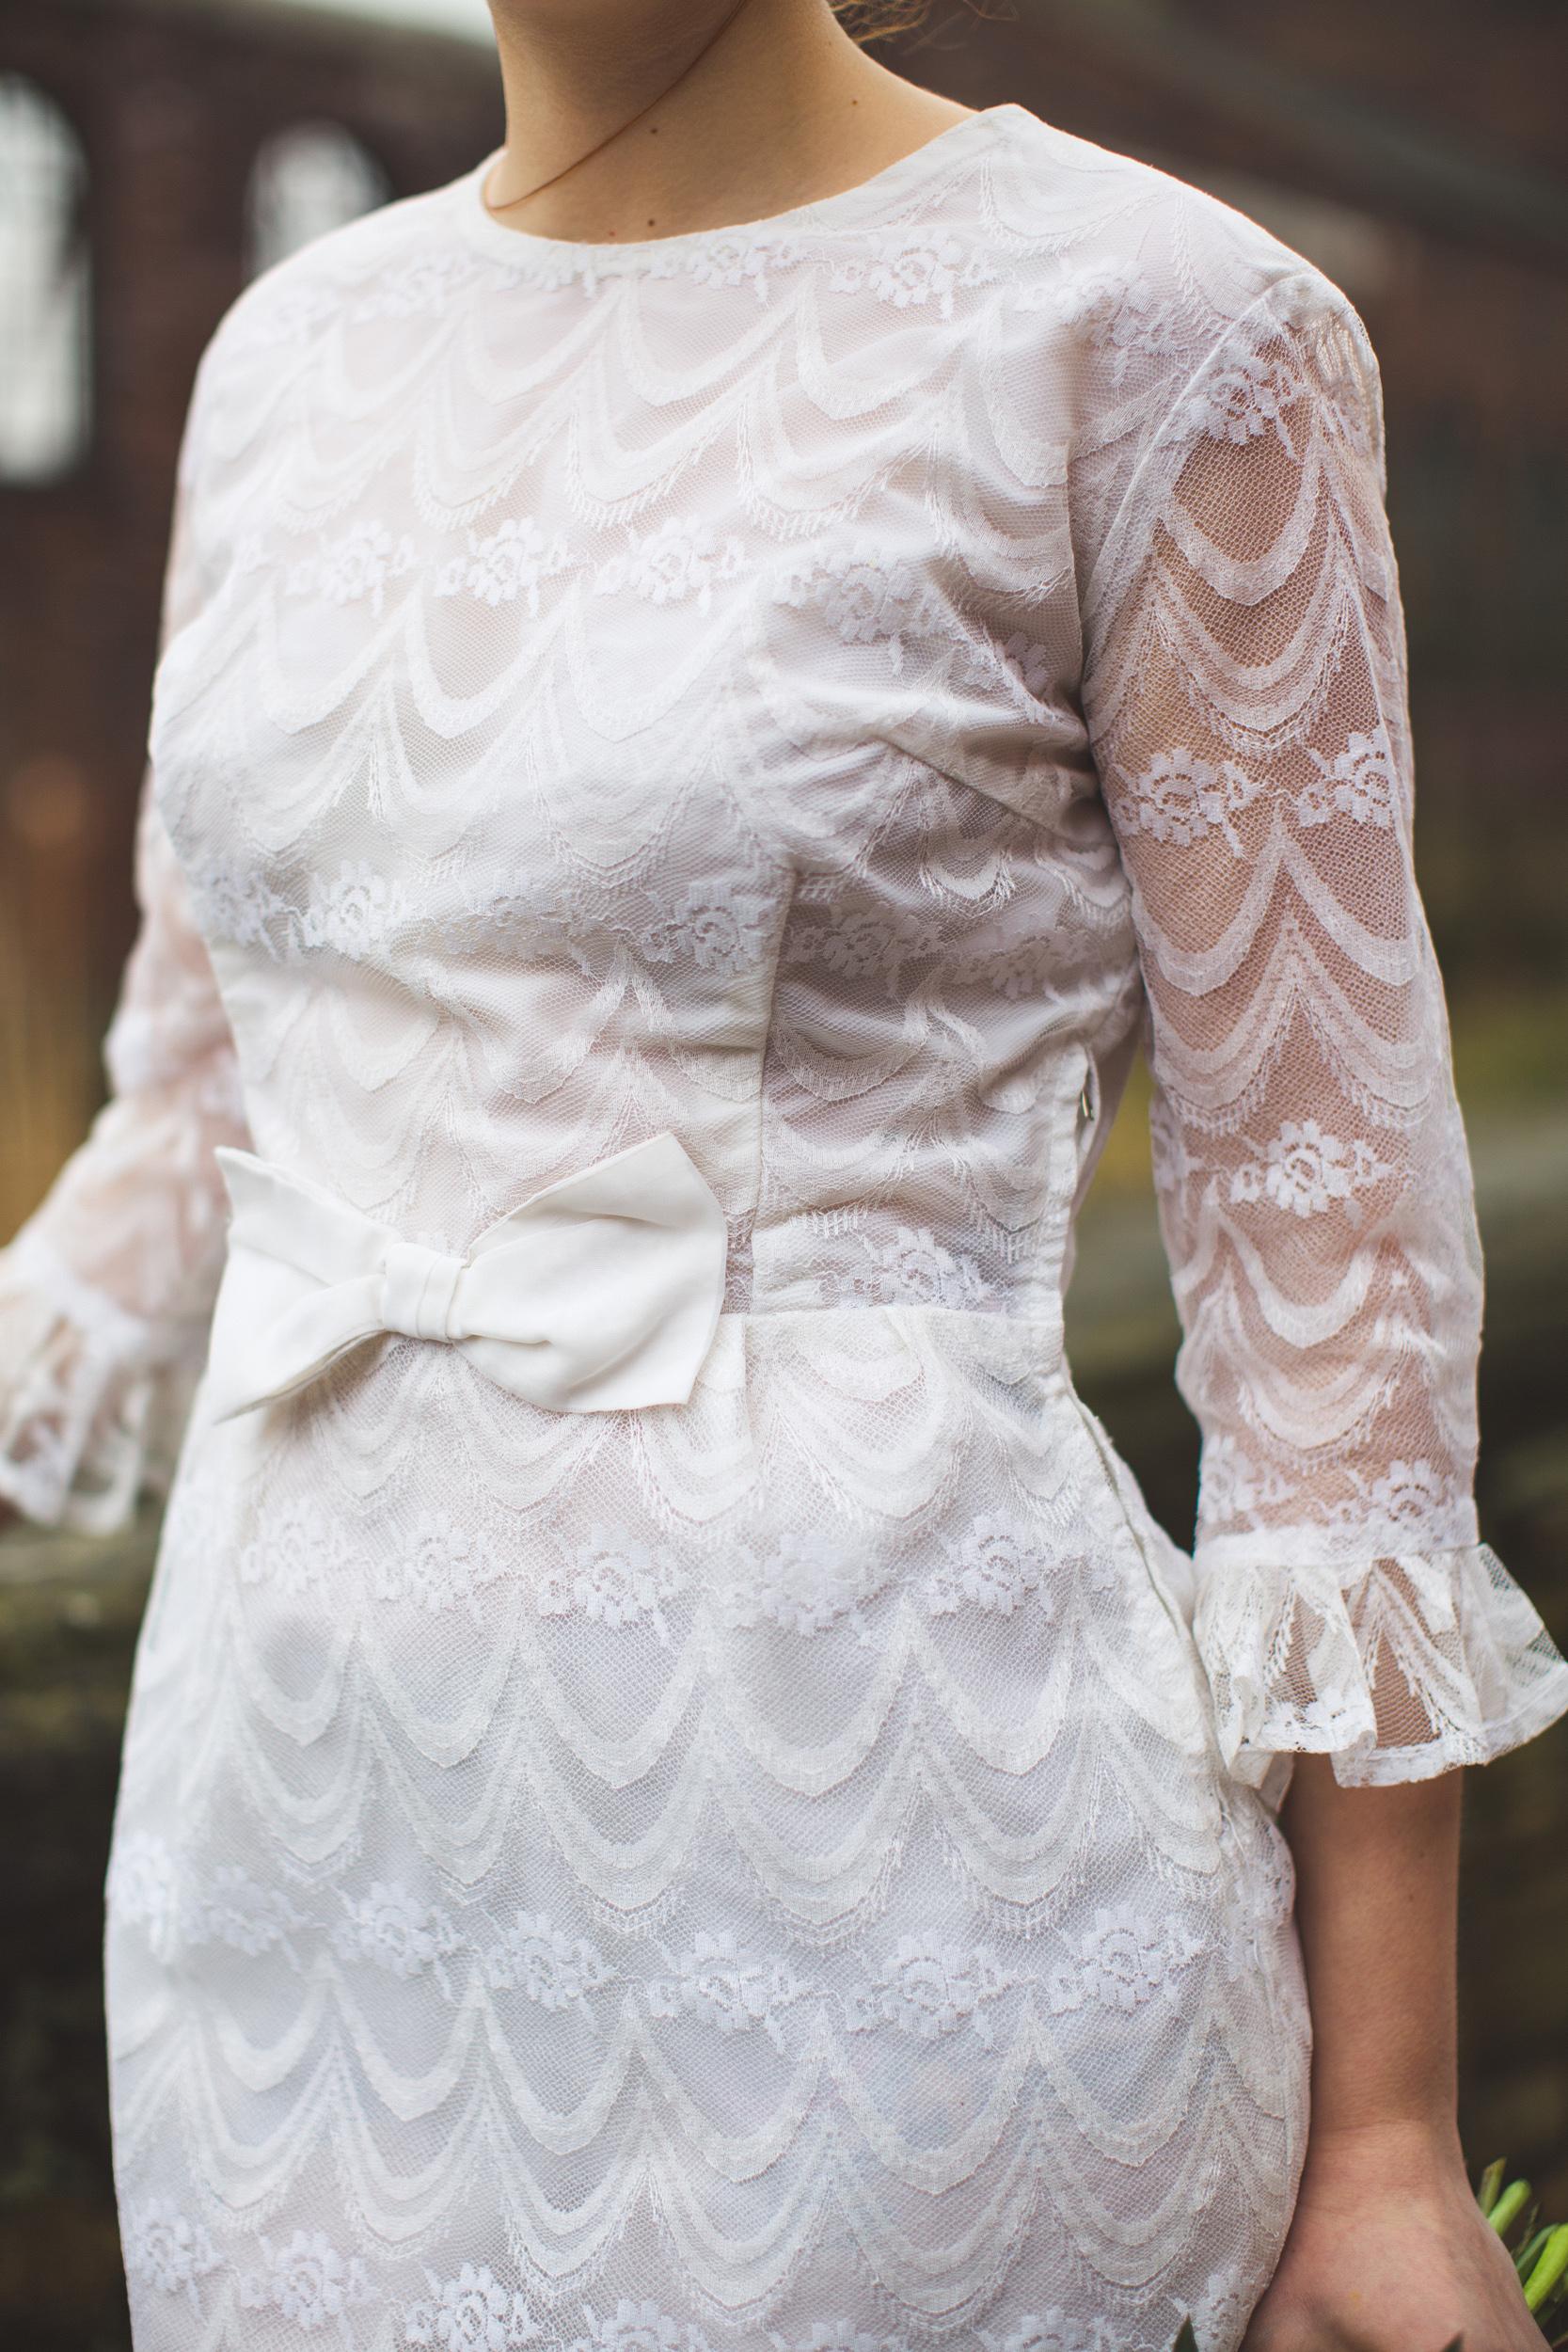 kate-beaumont-vintage-bridal-wedding-dresses-Sheffield-S6-3.jpg